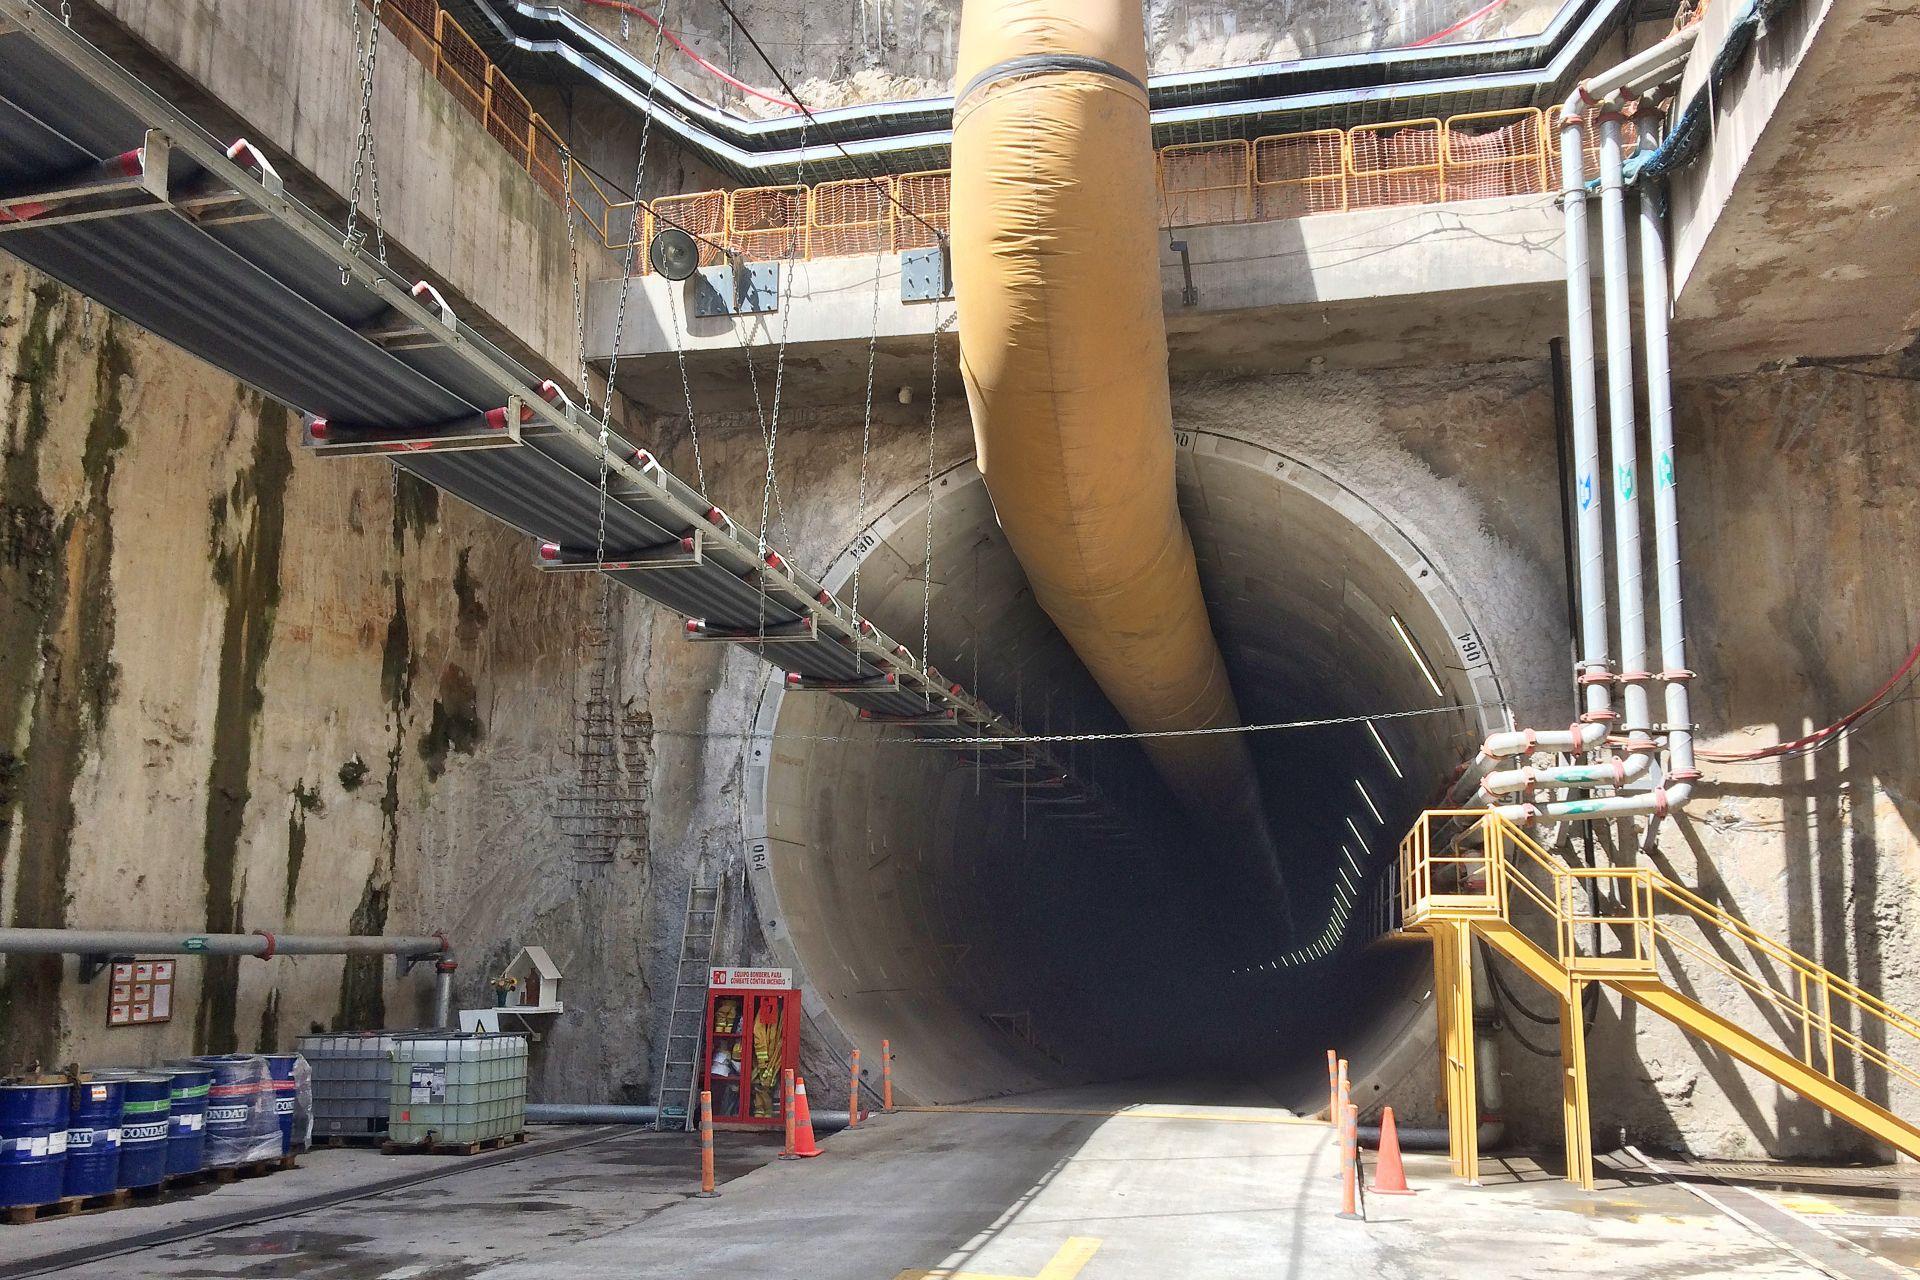 Tunnel built for the metro in Quito, Ecuador